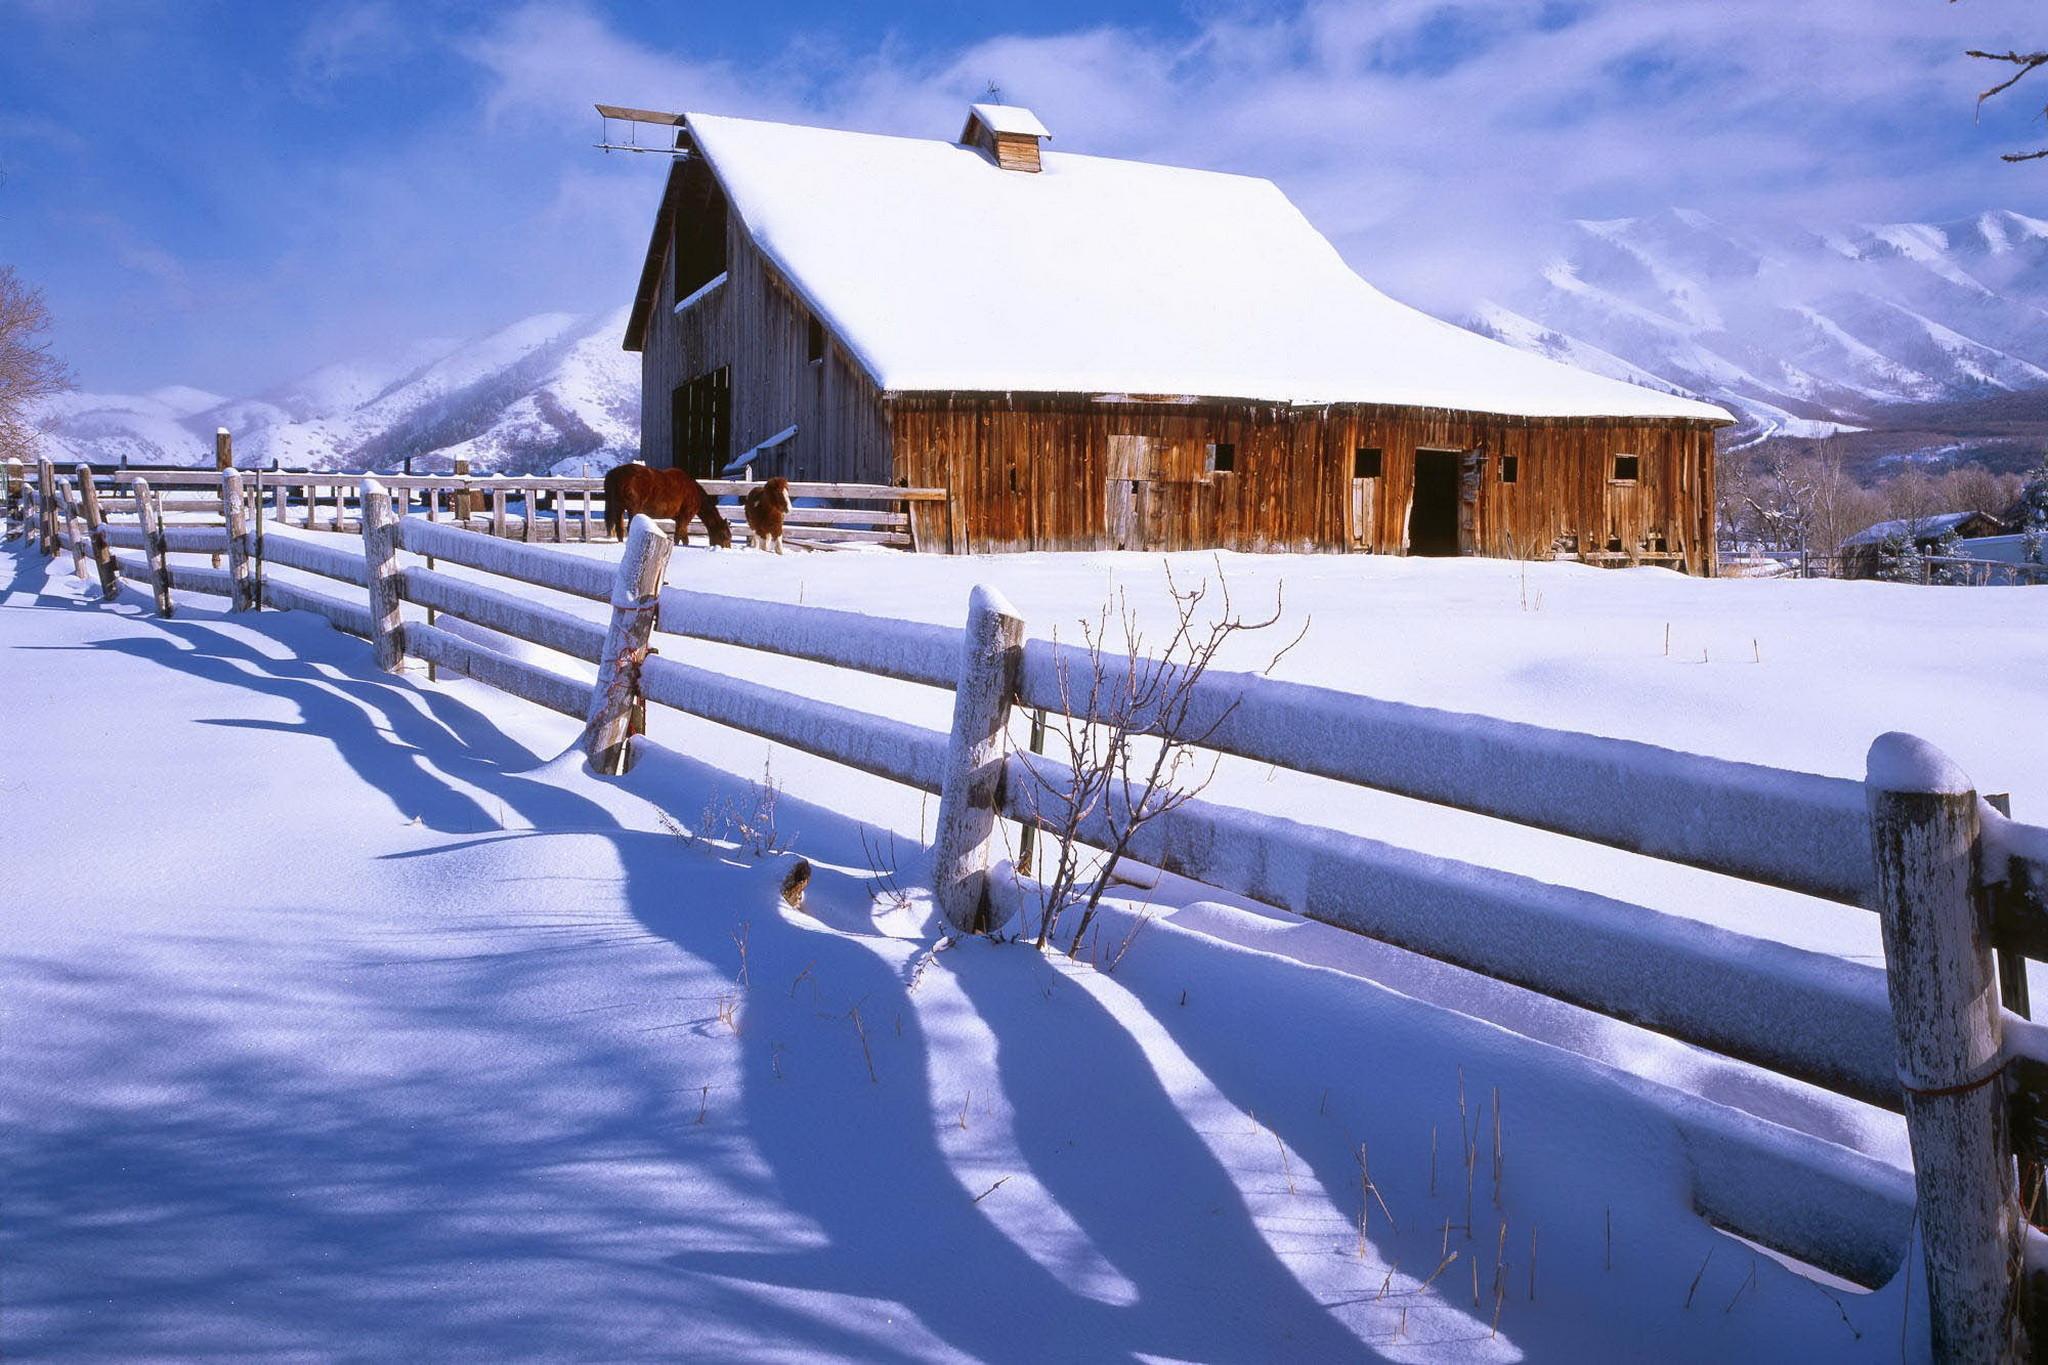 Farm Winter Scenes Desktop Wallpaper (37+ images)